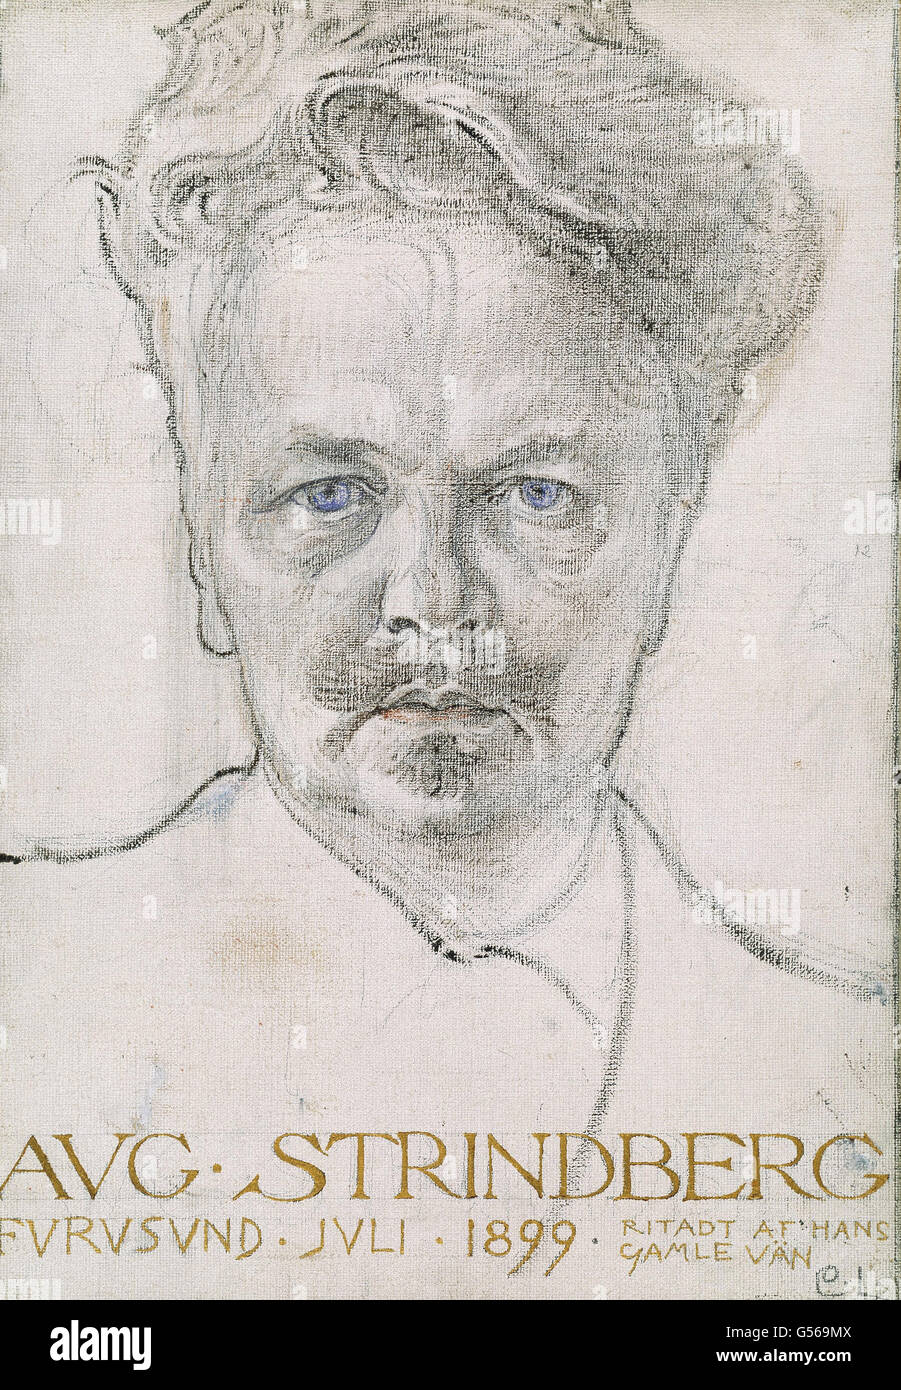 Carl Larsson - The author August Strindberg - Stock Image